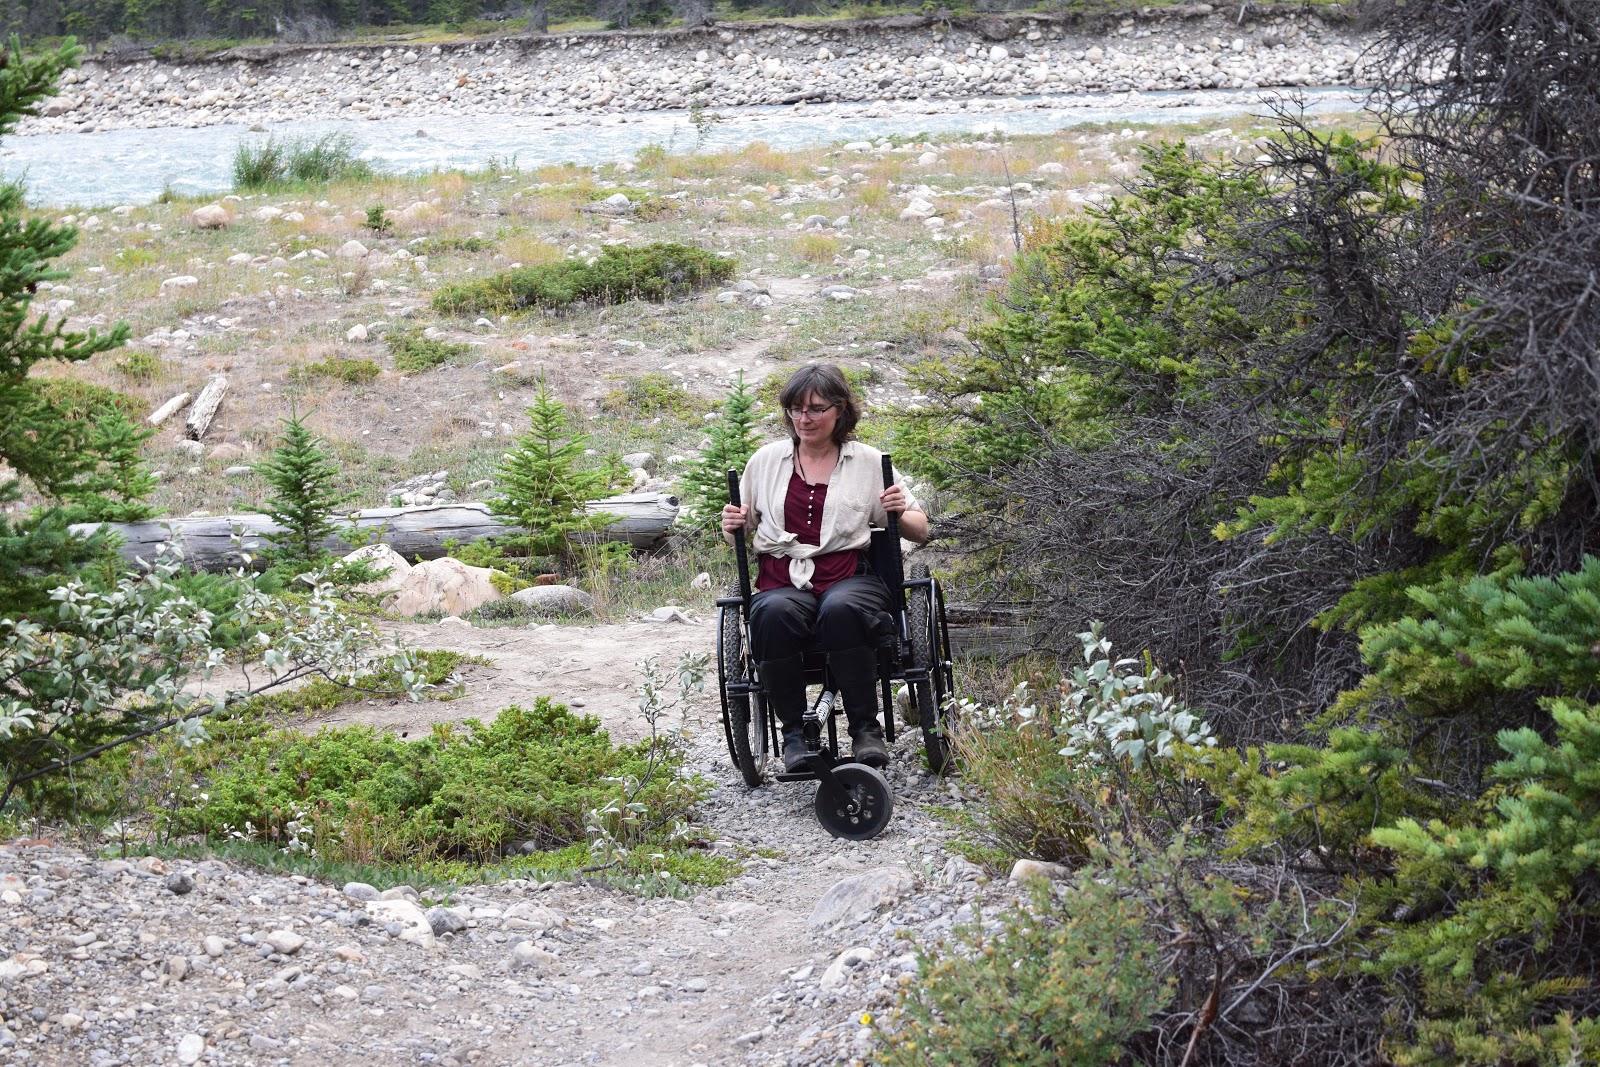 Snaring River in Jasper National Park